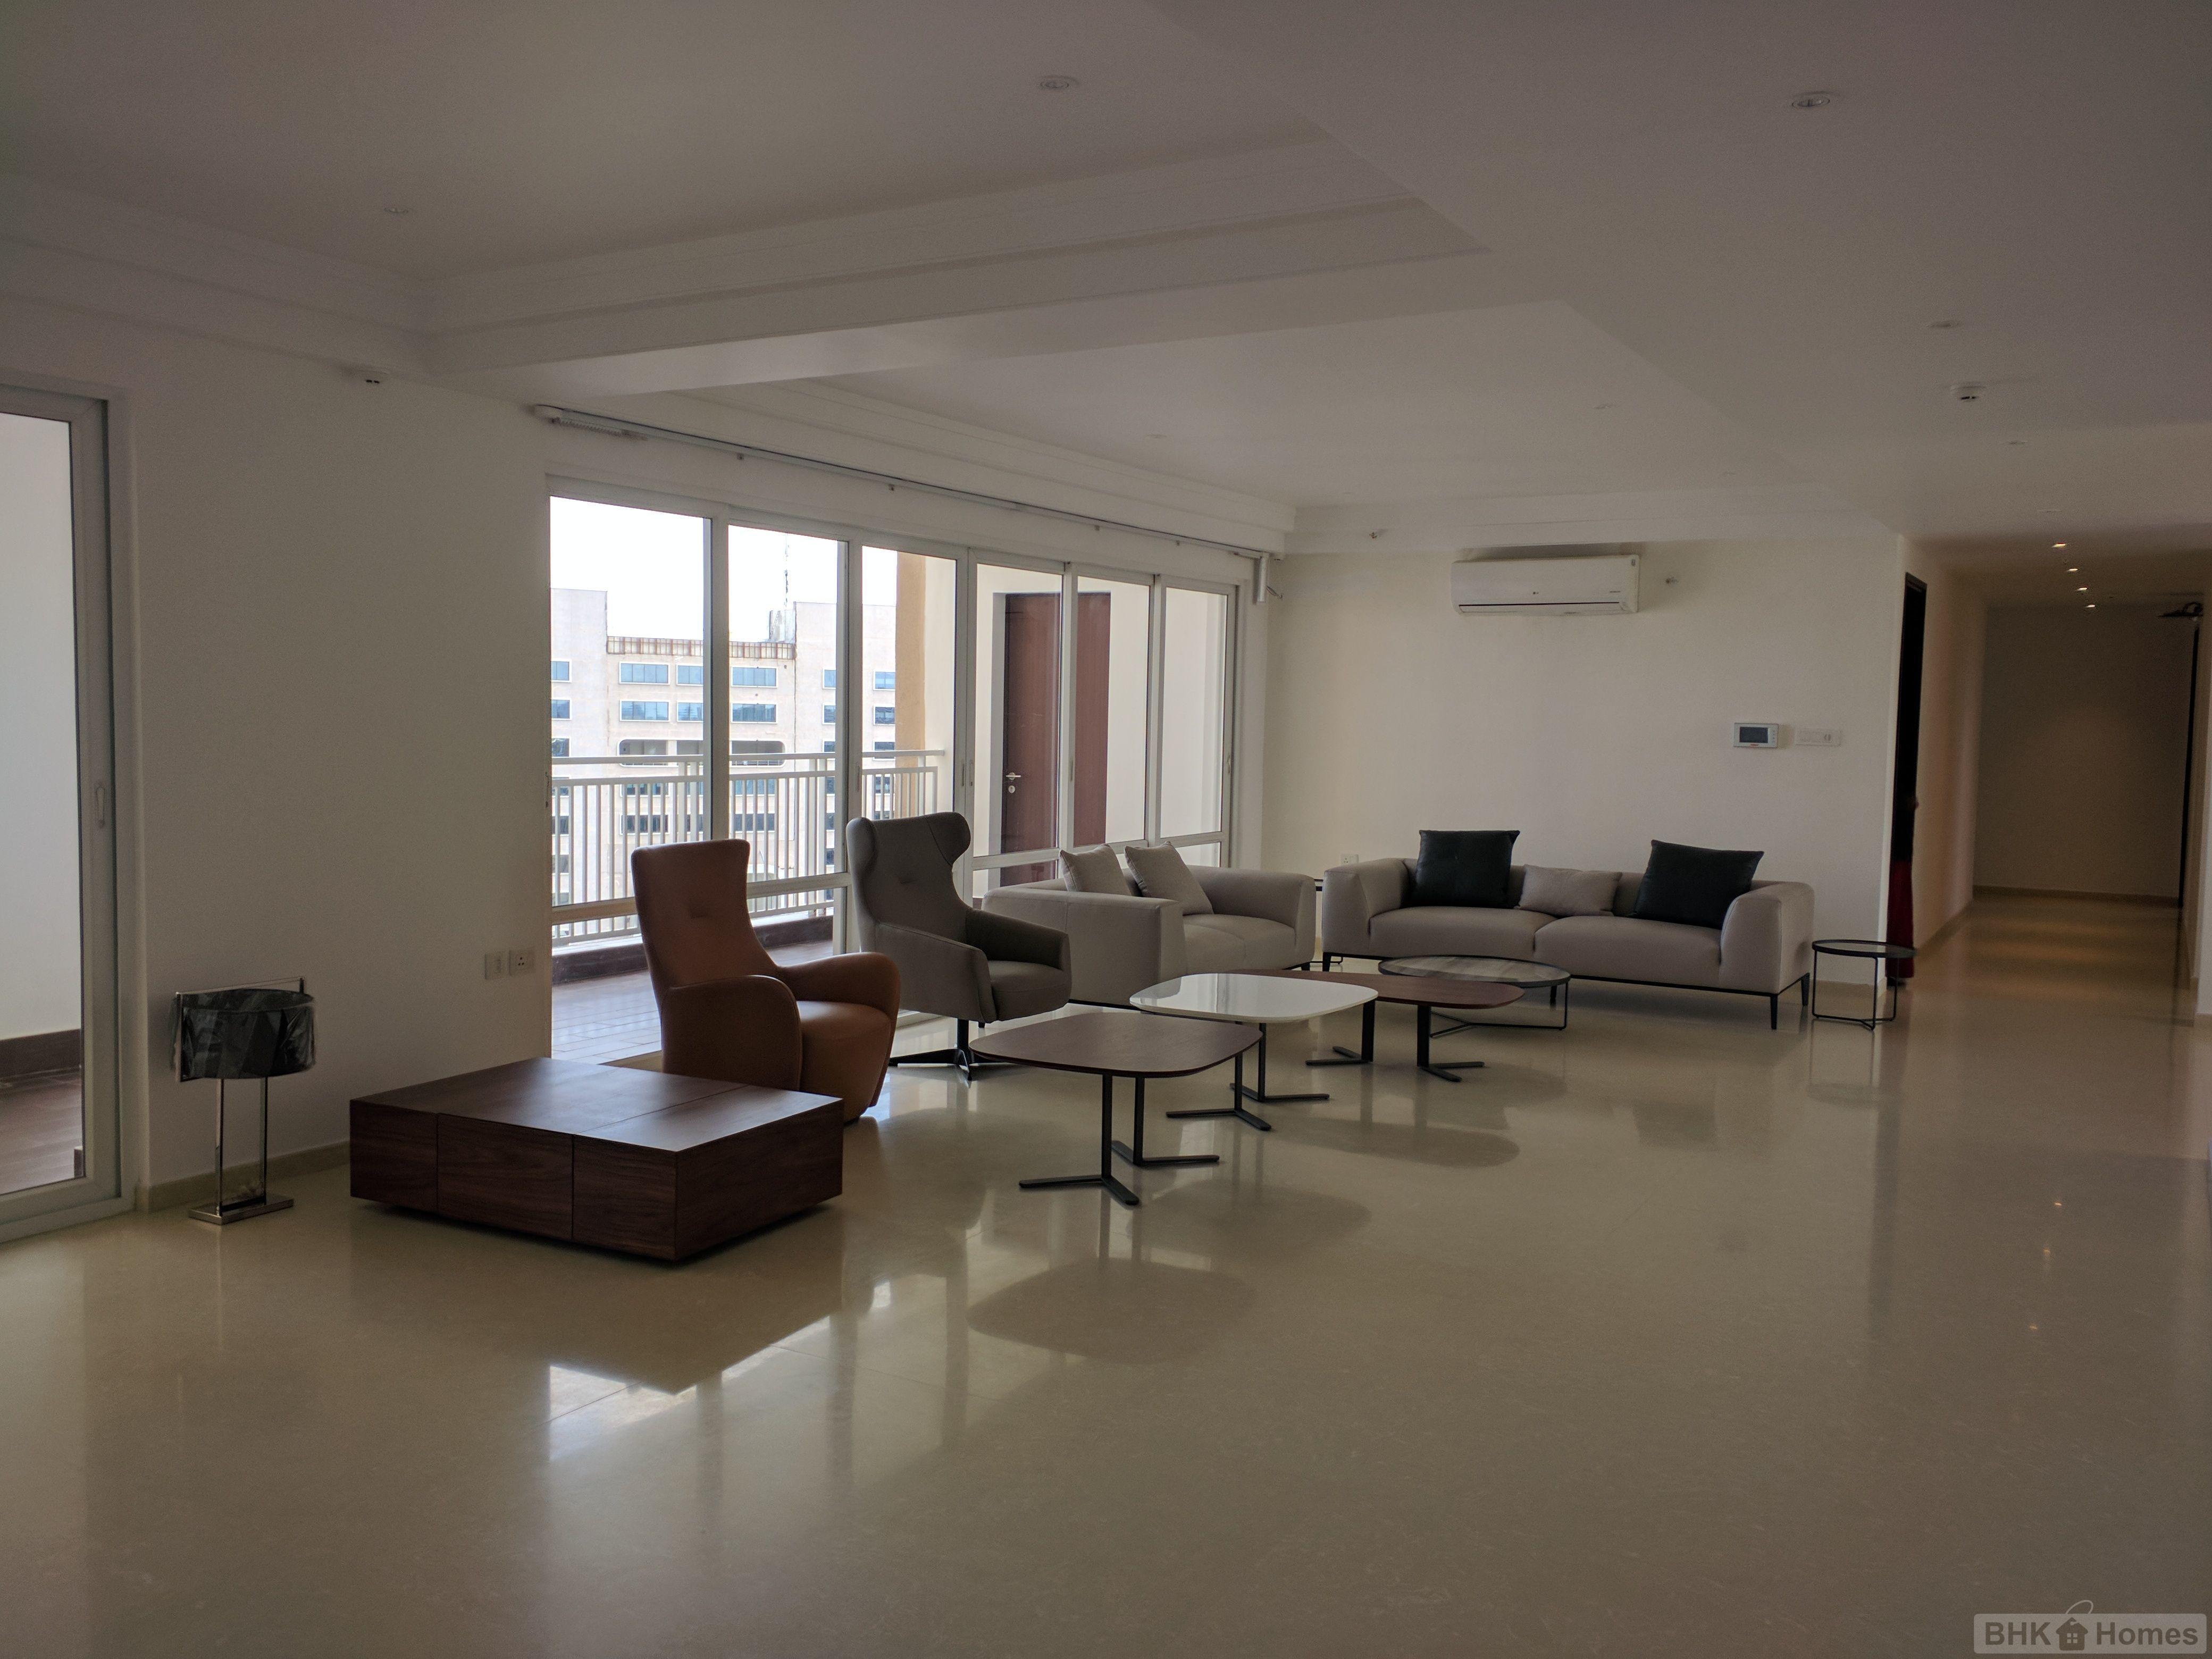 4 BHK Apartment for Sale in  Gachibowli